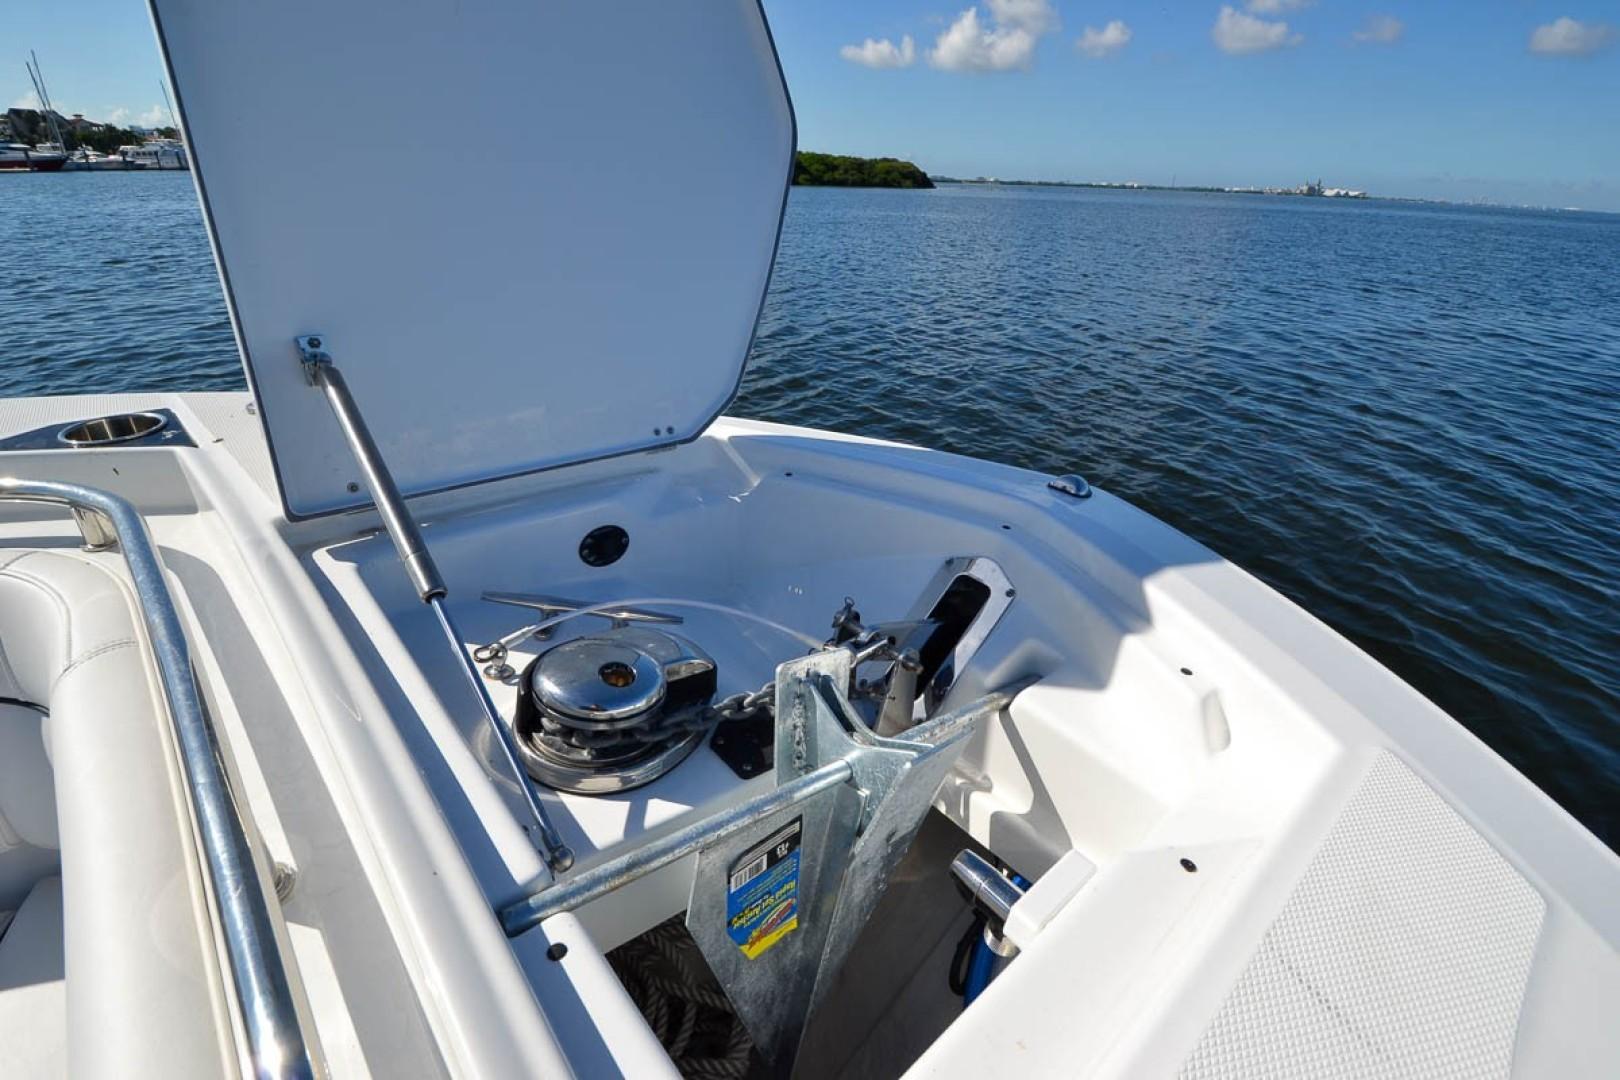 Windlass and Stern Anchor